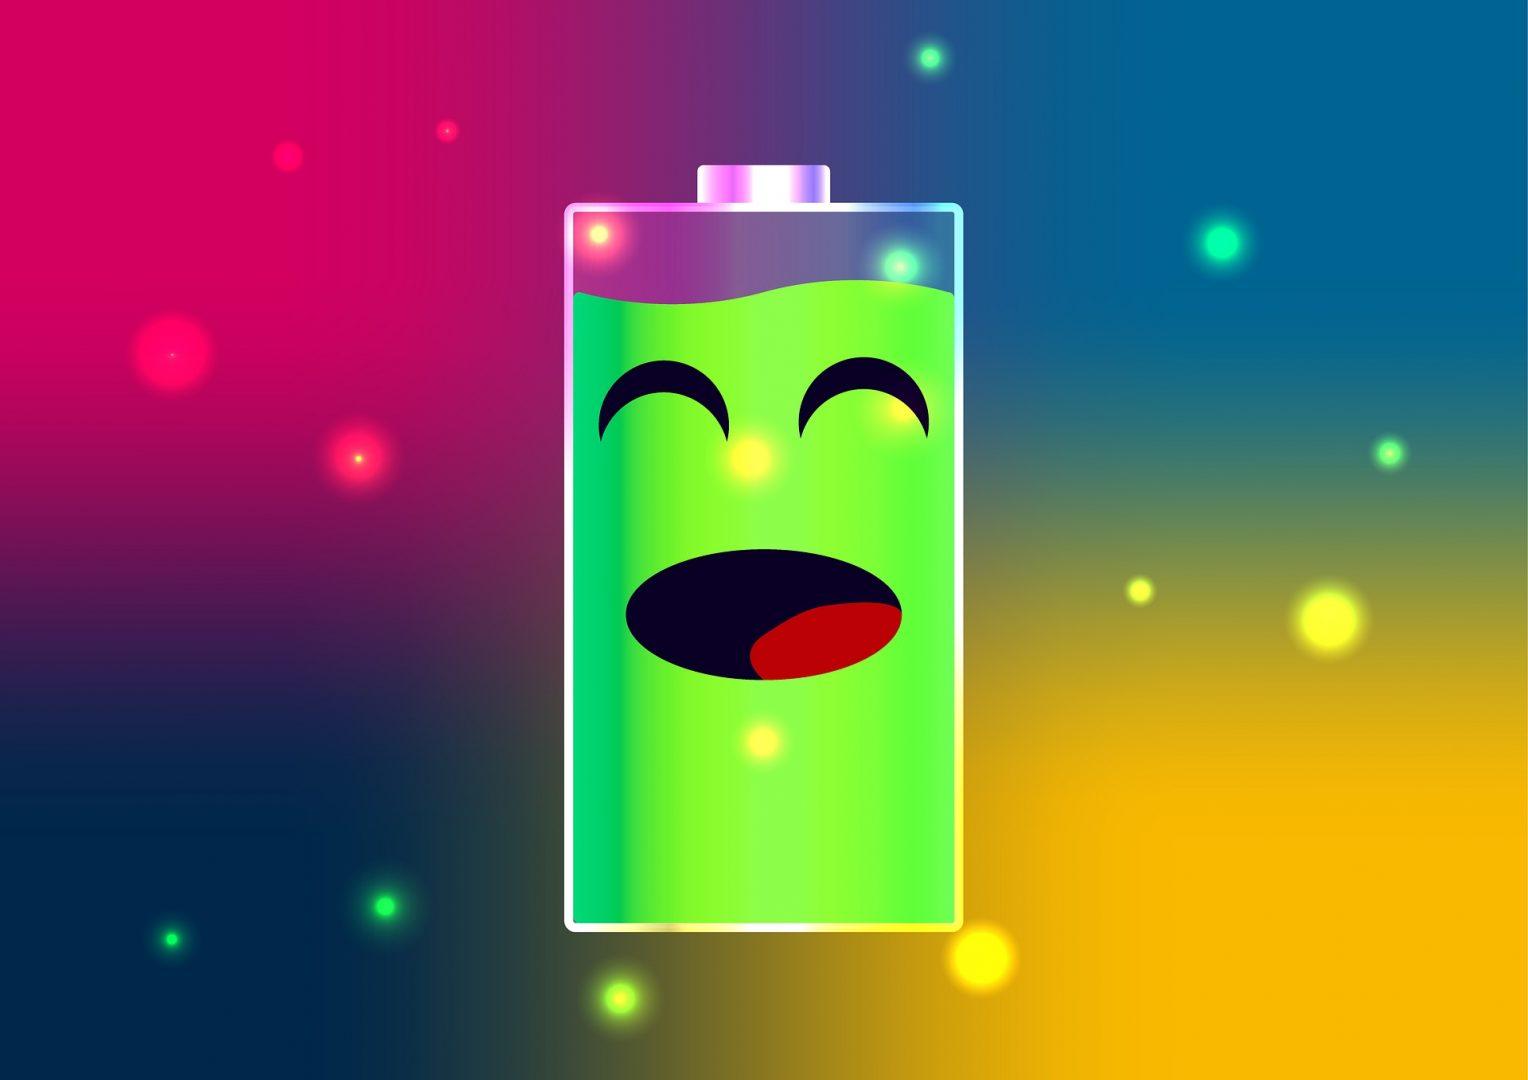 Phone battery